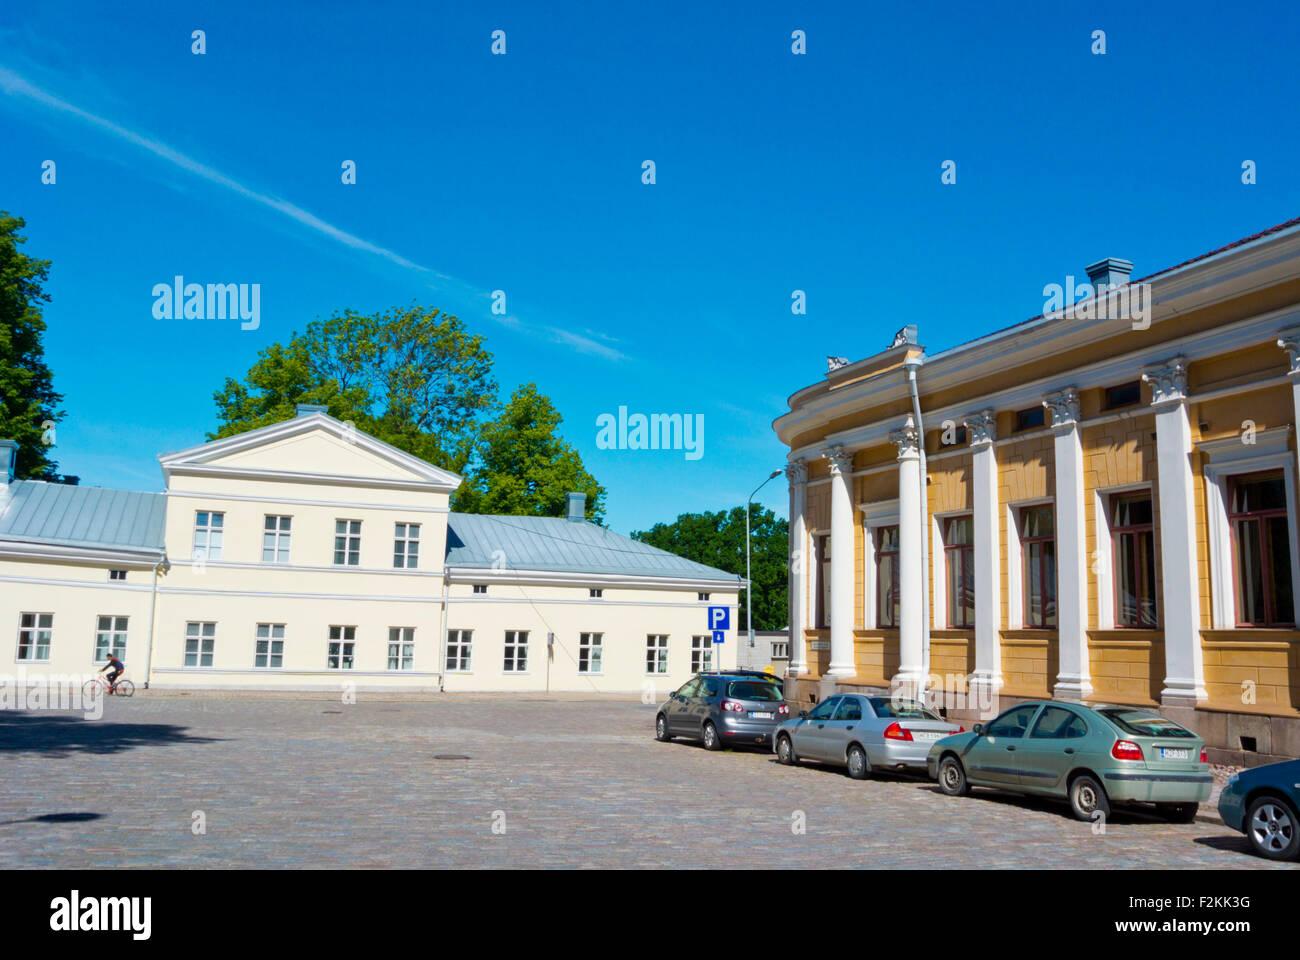 Tryckerihuset, Åbo-Akademie, schwedische Sprache Universitätscampus, Turku, Finnland Stockbild